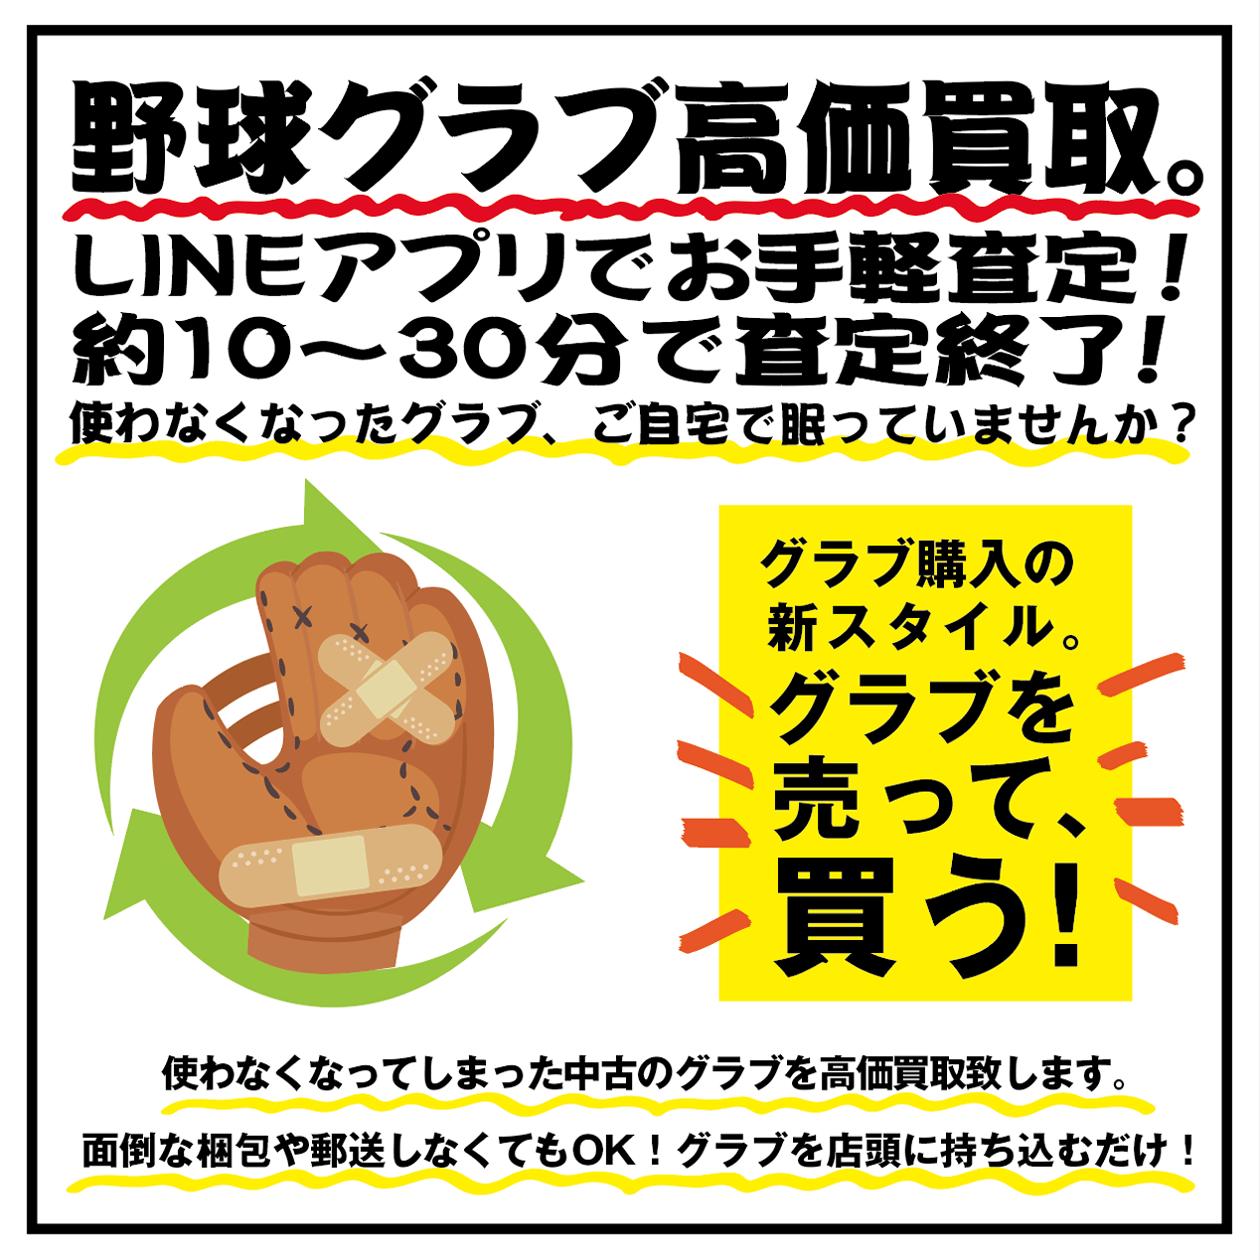 http://www.playsports.jp/news/images/%E8%B2%B7%E5%8F%962.png